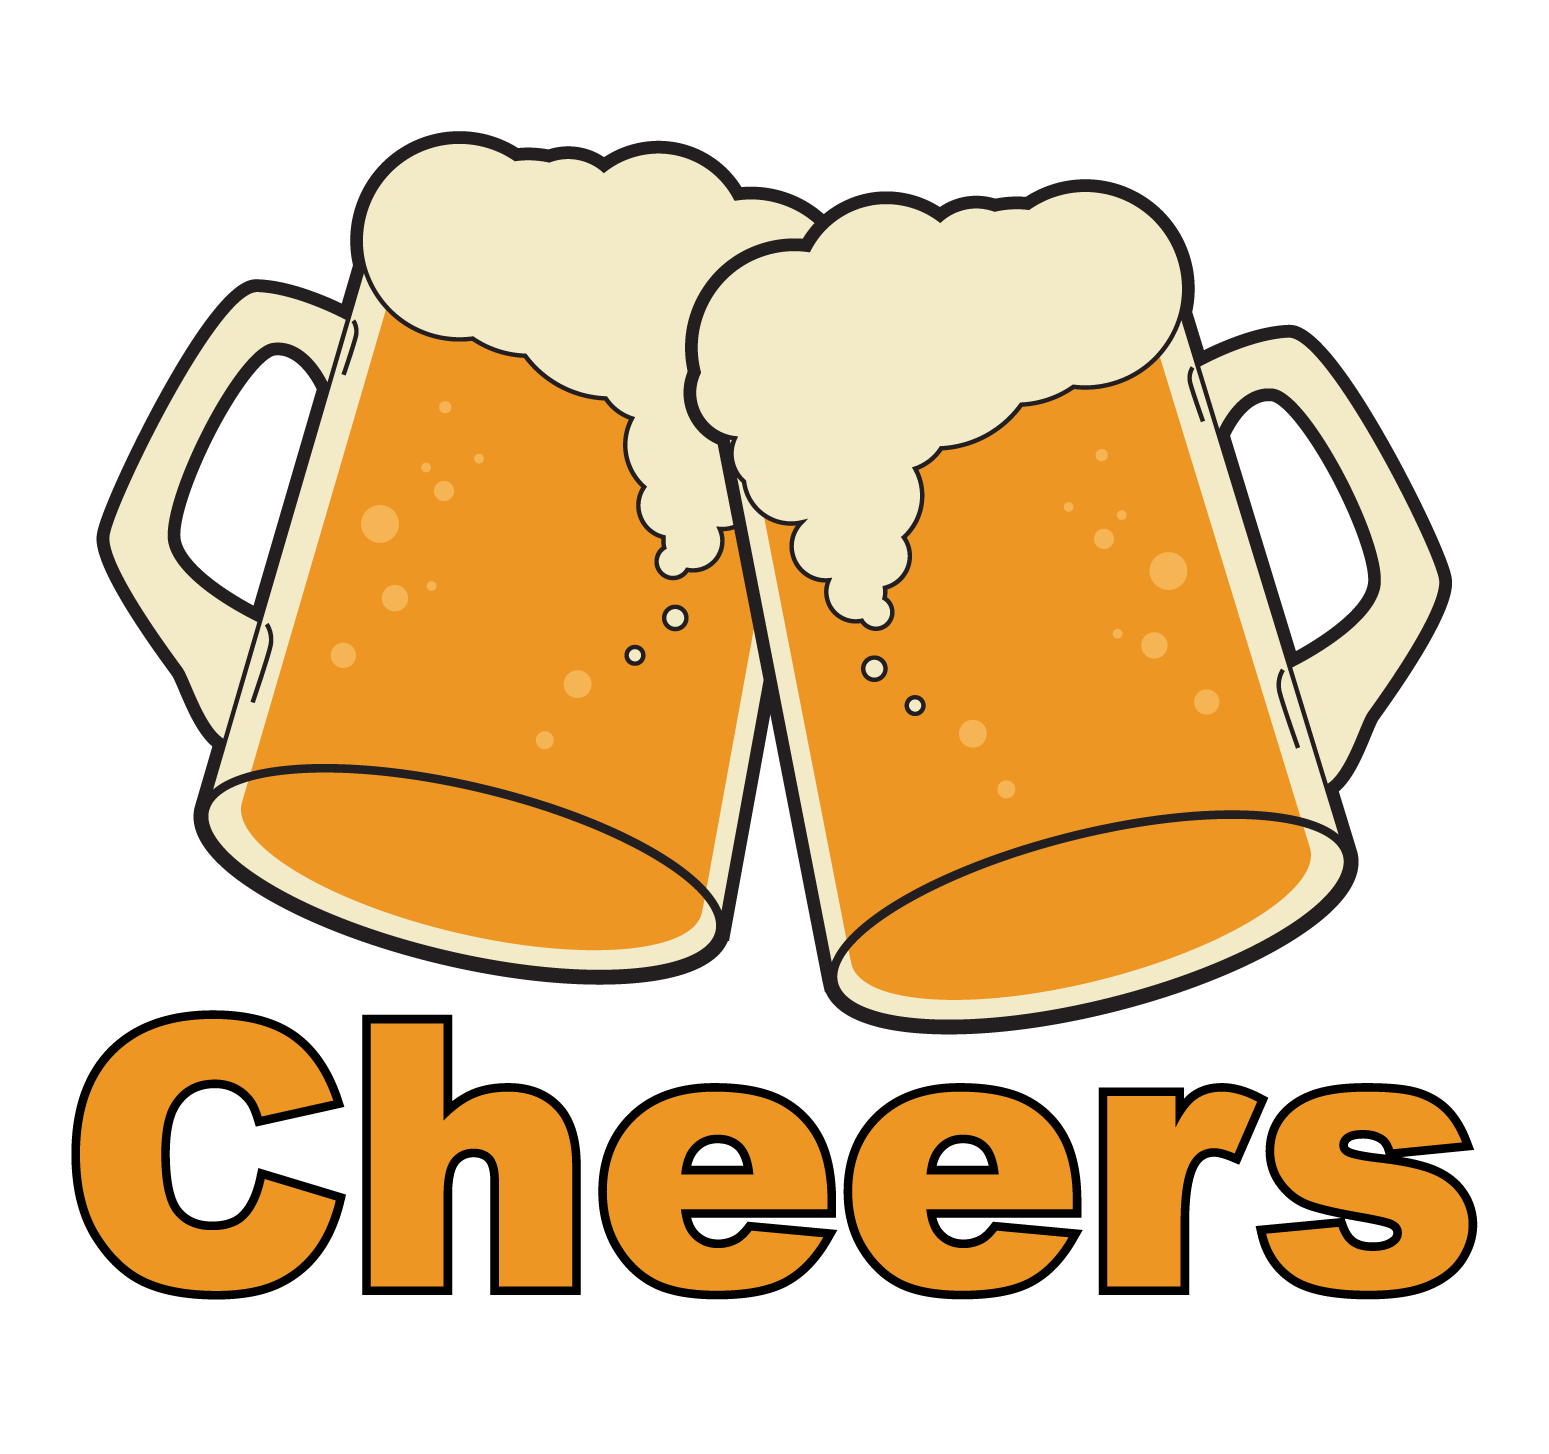 vector royalty free library cheers vector beer mug #91570901